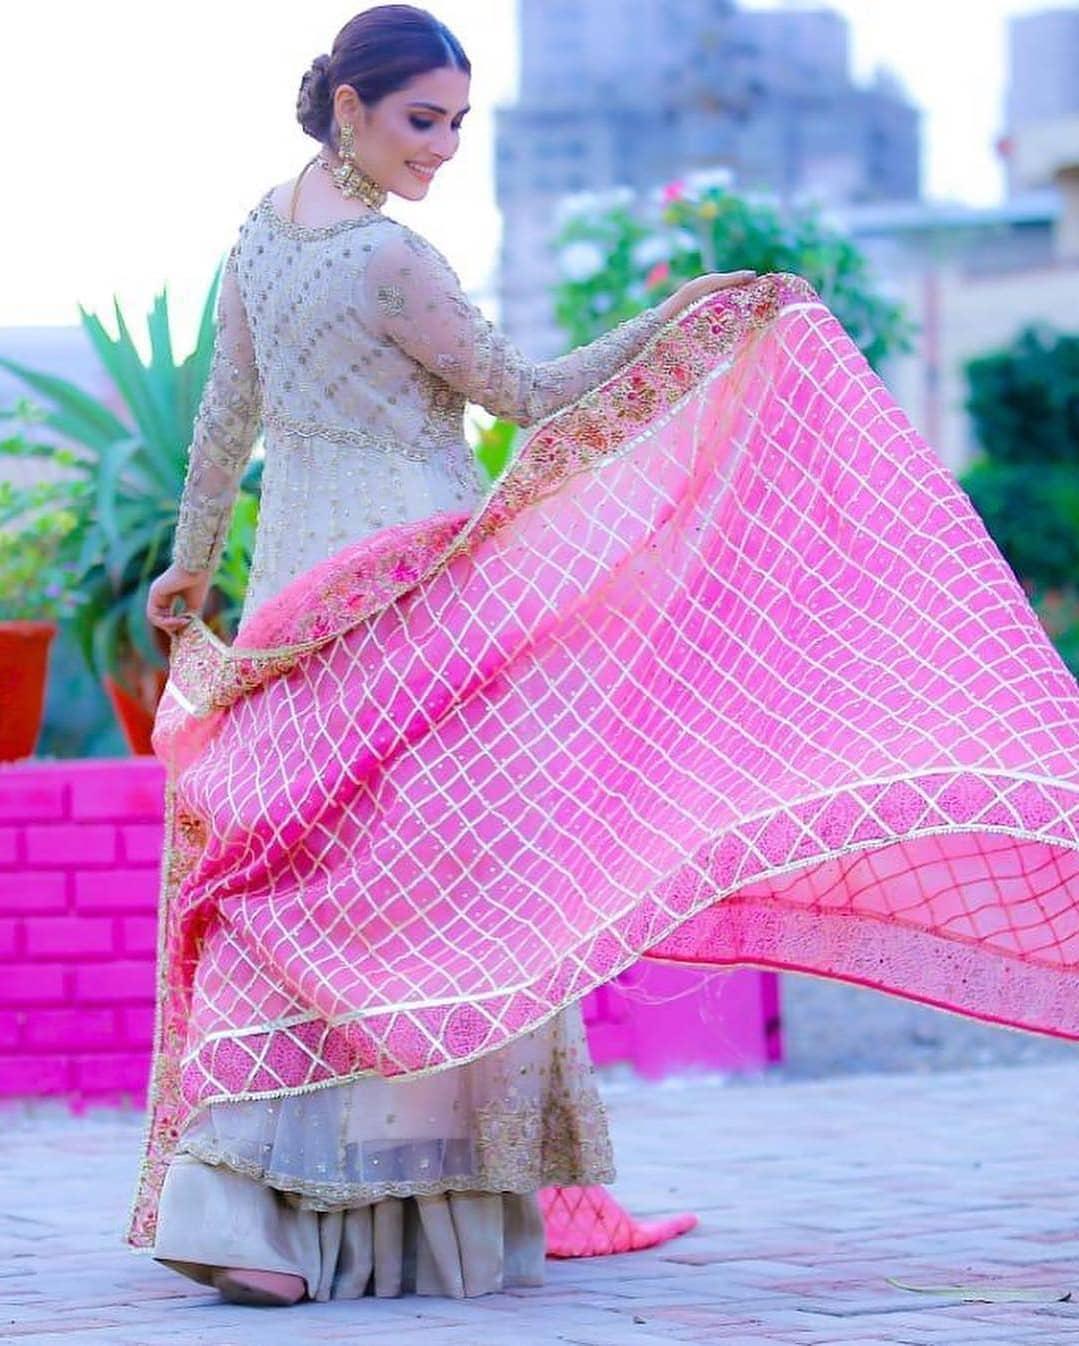 New Awesome Photos of Ayeza Khan on set of her Upcoming Drama